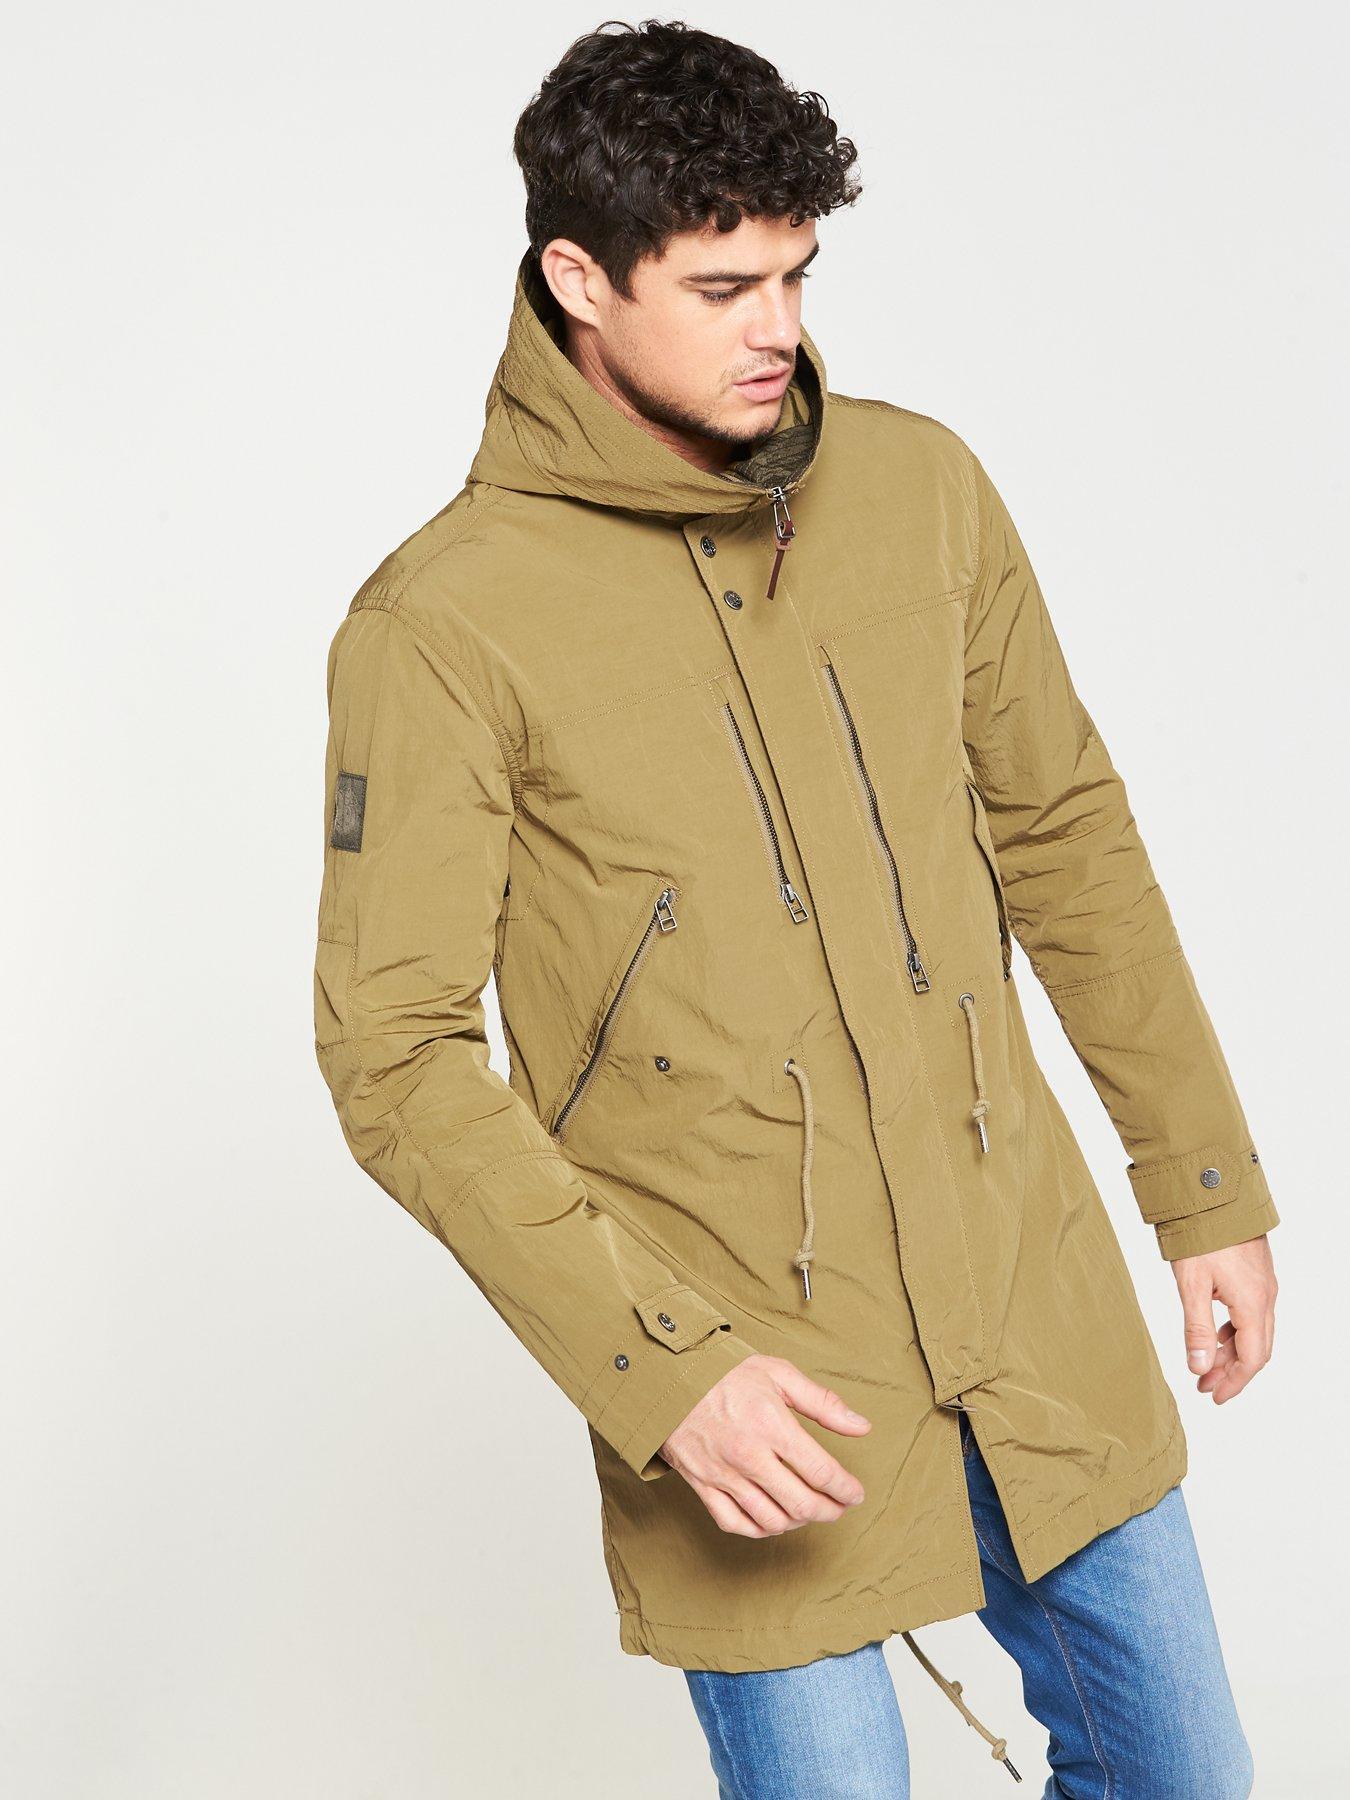 amp; ie Coats Jackets Pretty Littlewoodsireland Green S Men C6Ttqn